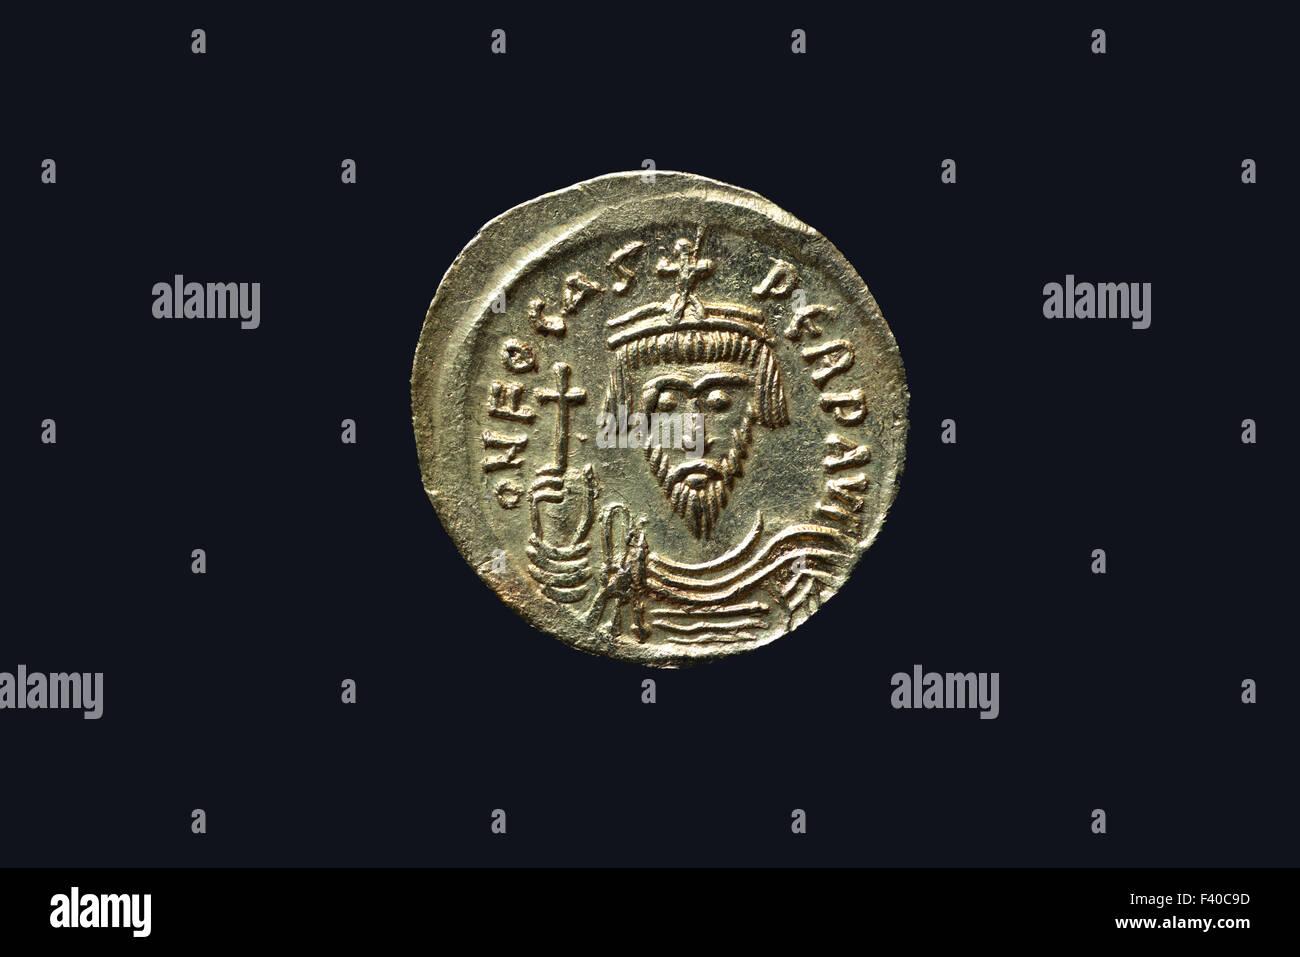 Byzantine Gold Coin, Emperor Phocas - Stock Image